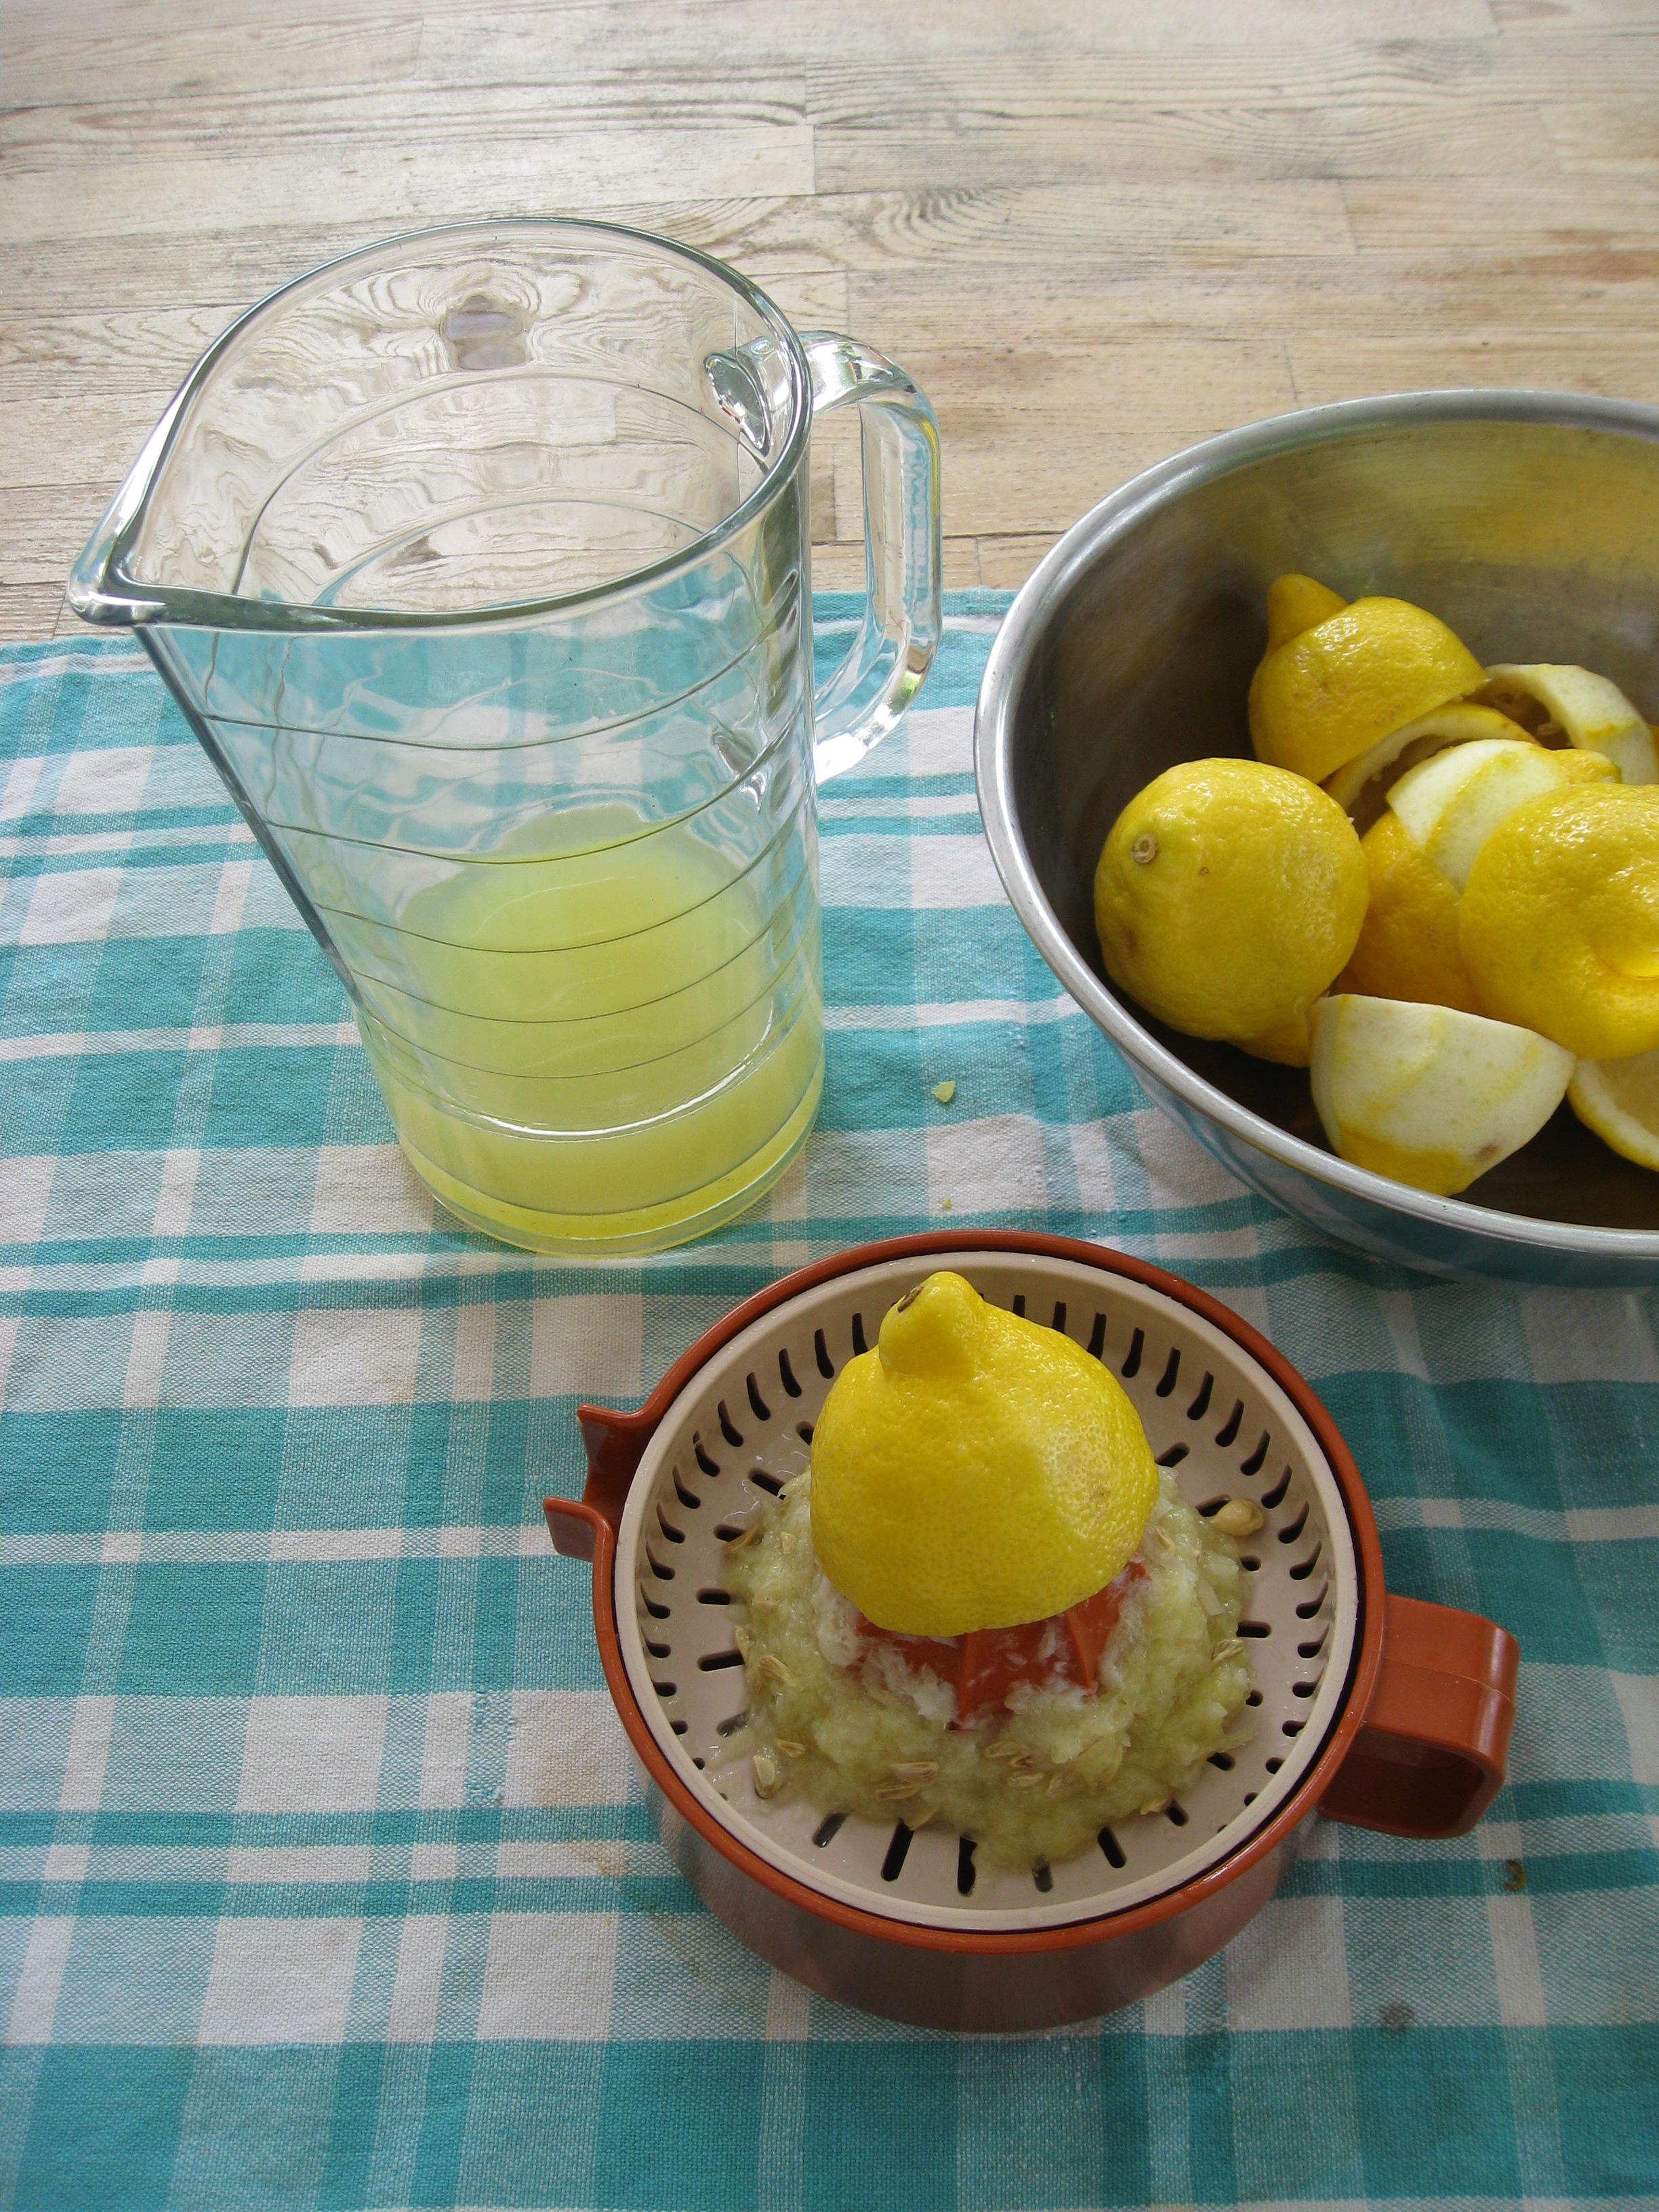 Picture of Juice Lemons